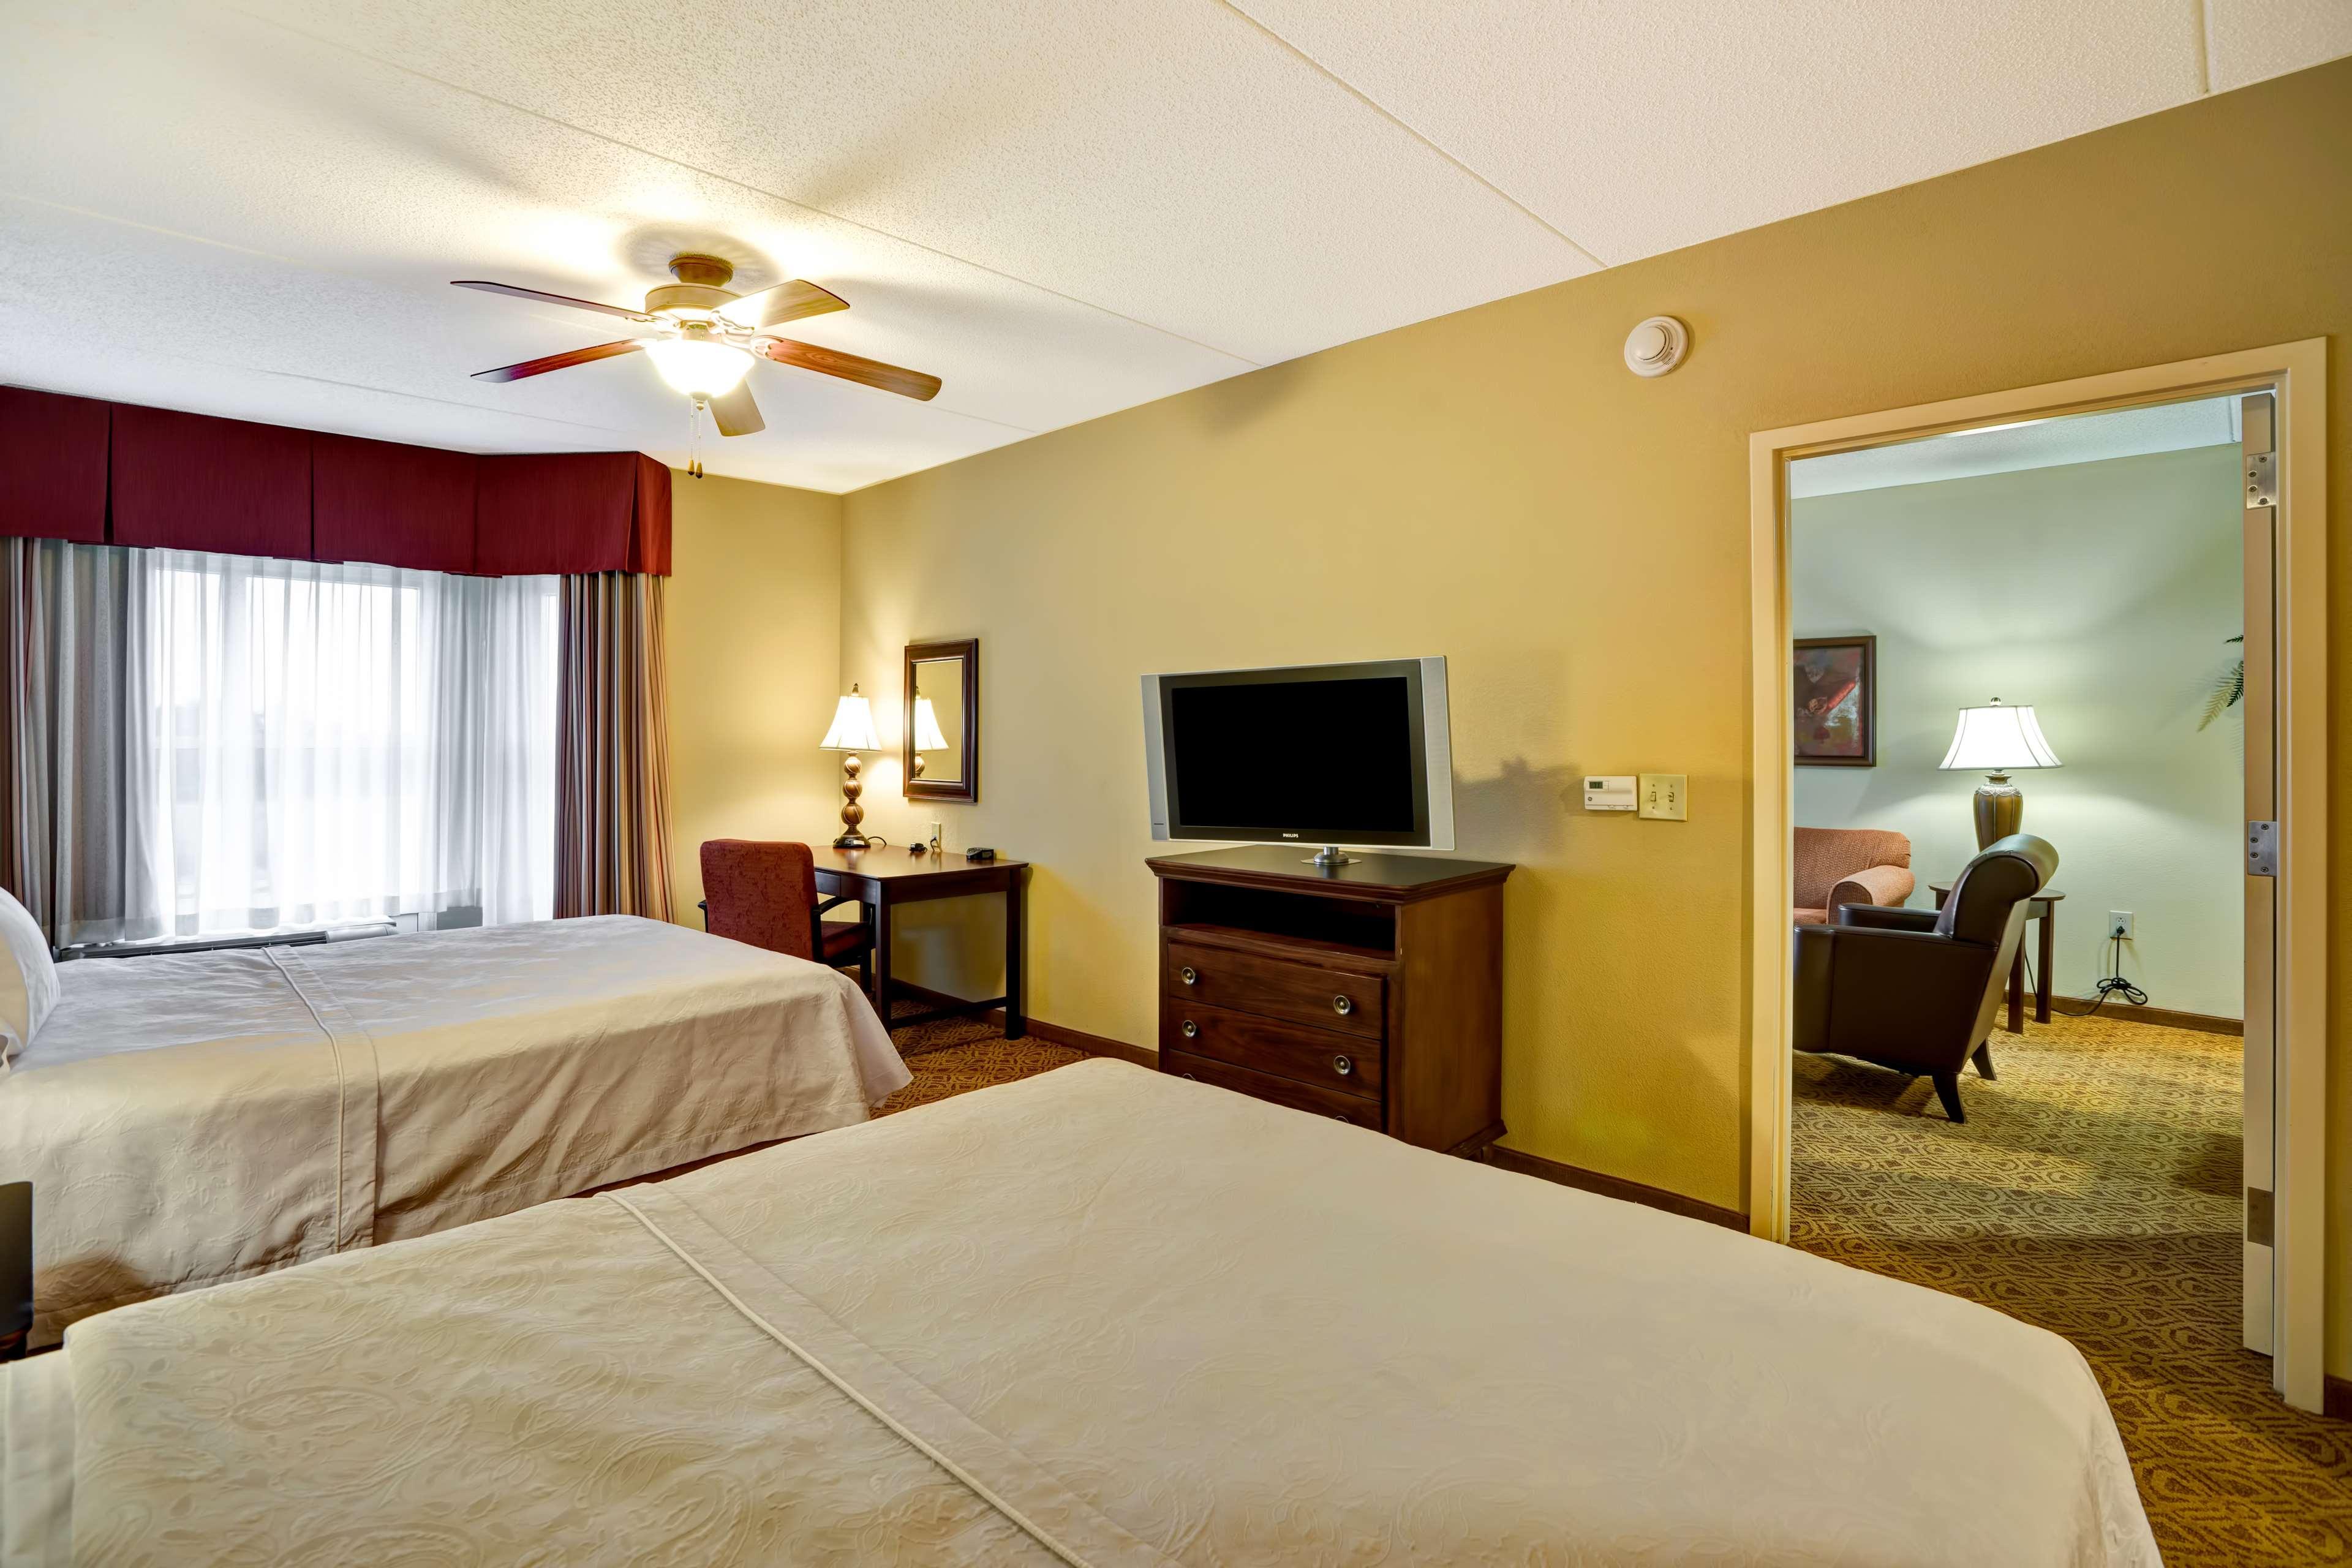 Homewood Suites by Hilton Fredericksburg image 23